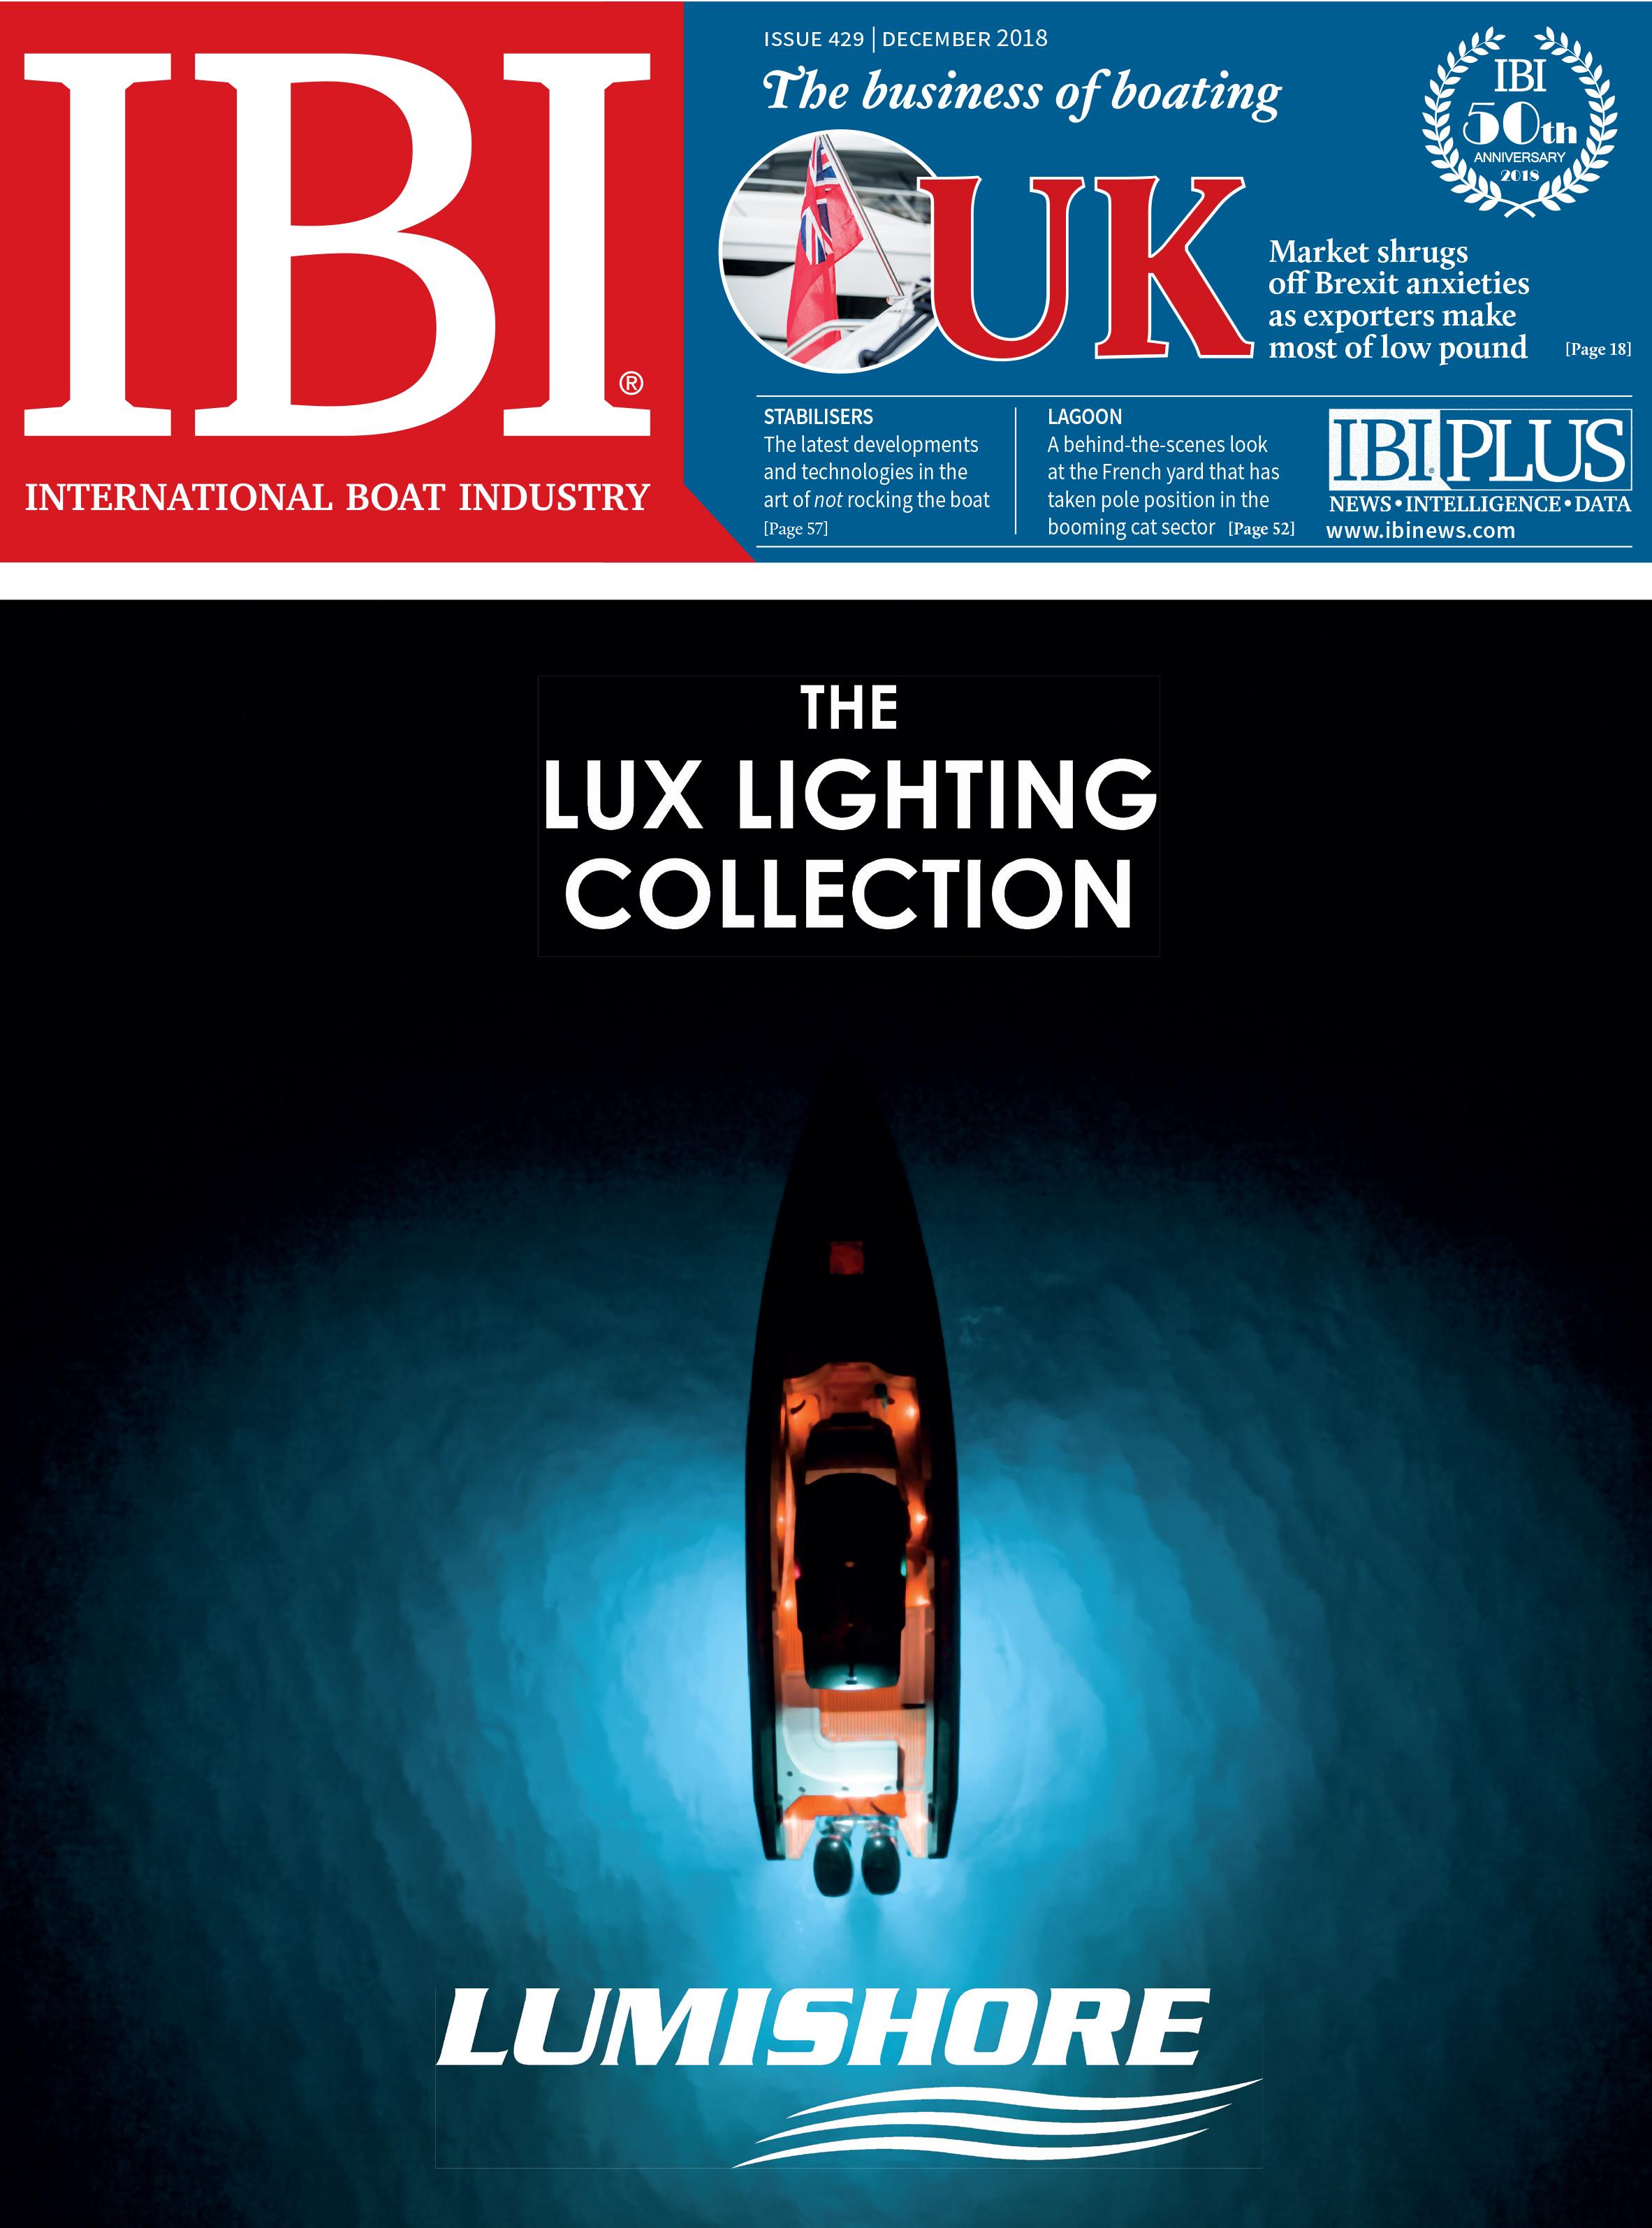 Cover1_IBI_December